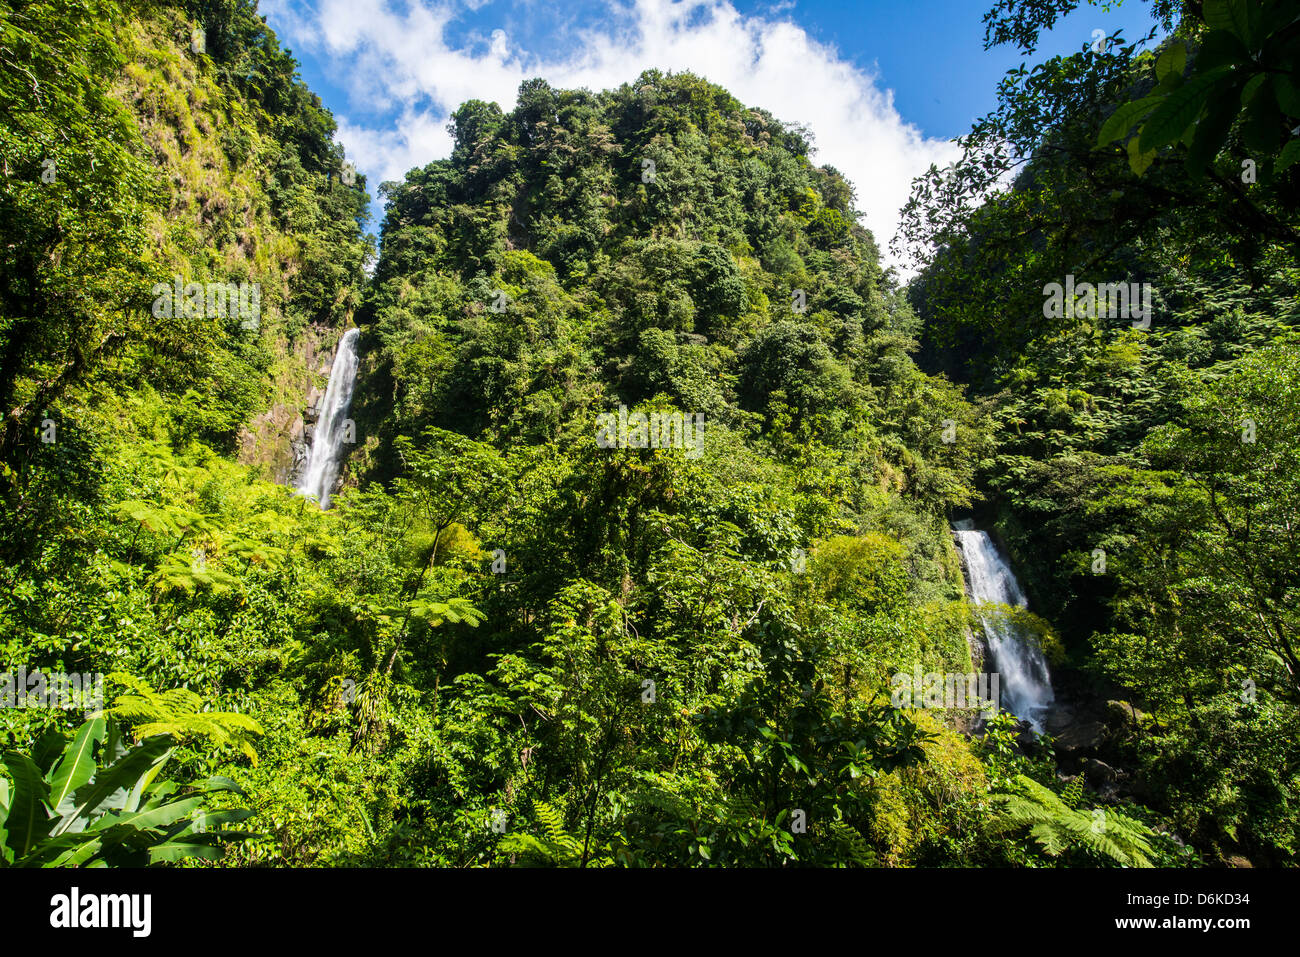 Trafalgar Falls, Morne Trois Pitons National Park, UNESCO World Heritage Site, Dominica, West Indies, Caribbean, - Stock Image